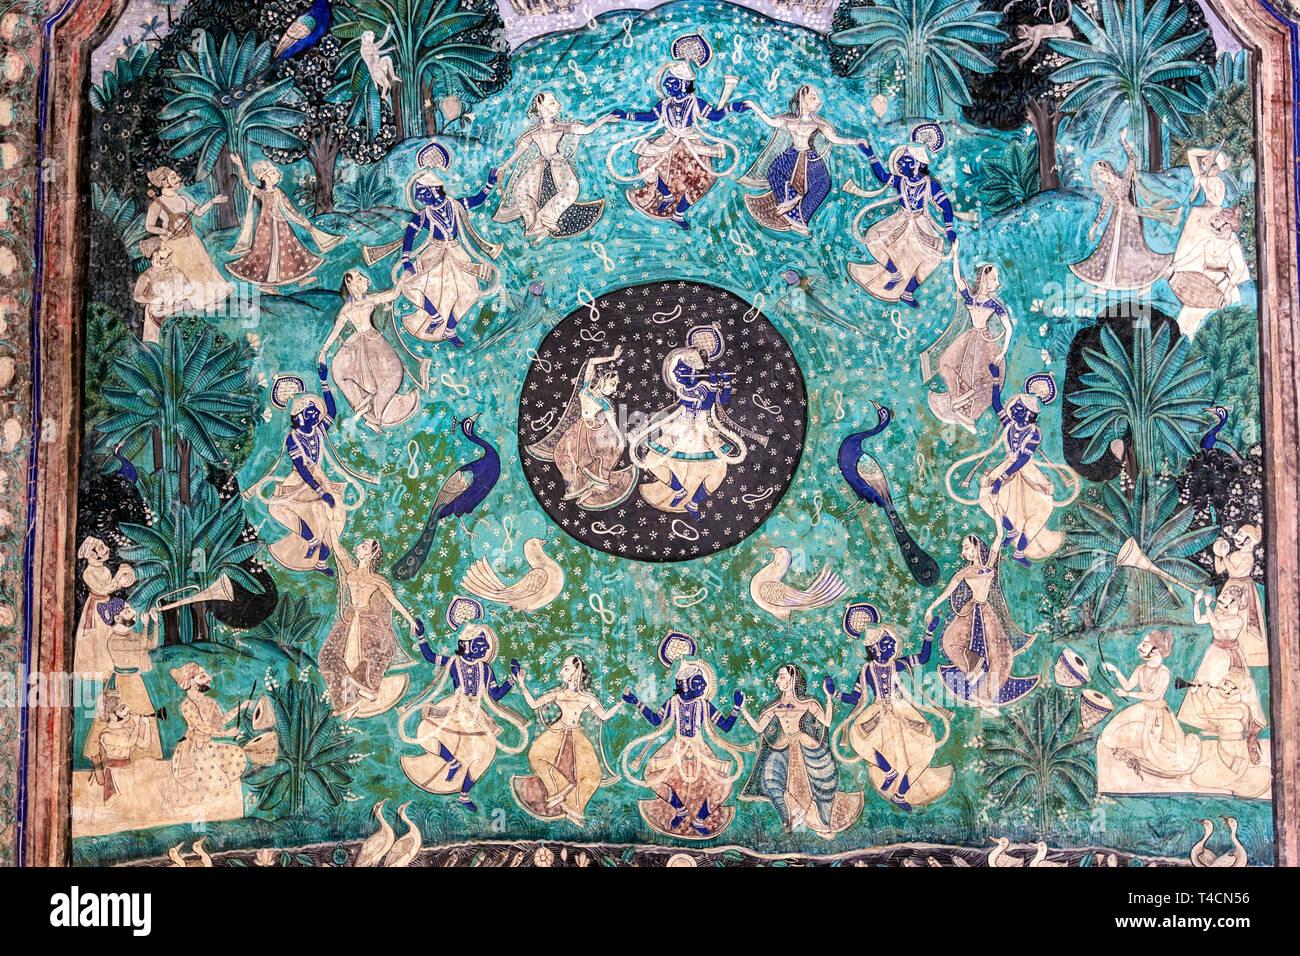 Lord Krishna Raas Leela painting, wall Paintings in west veranda, Chitra Mahal, Bundi Palace, Bundi, Rajasthan, India Stock Photo